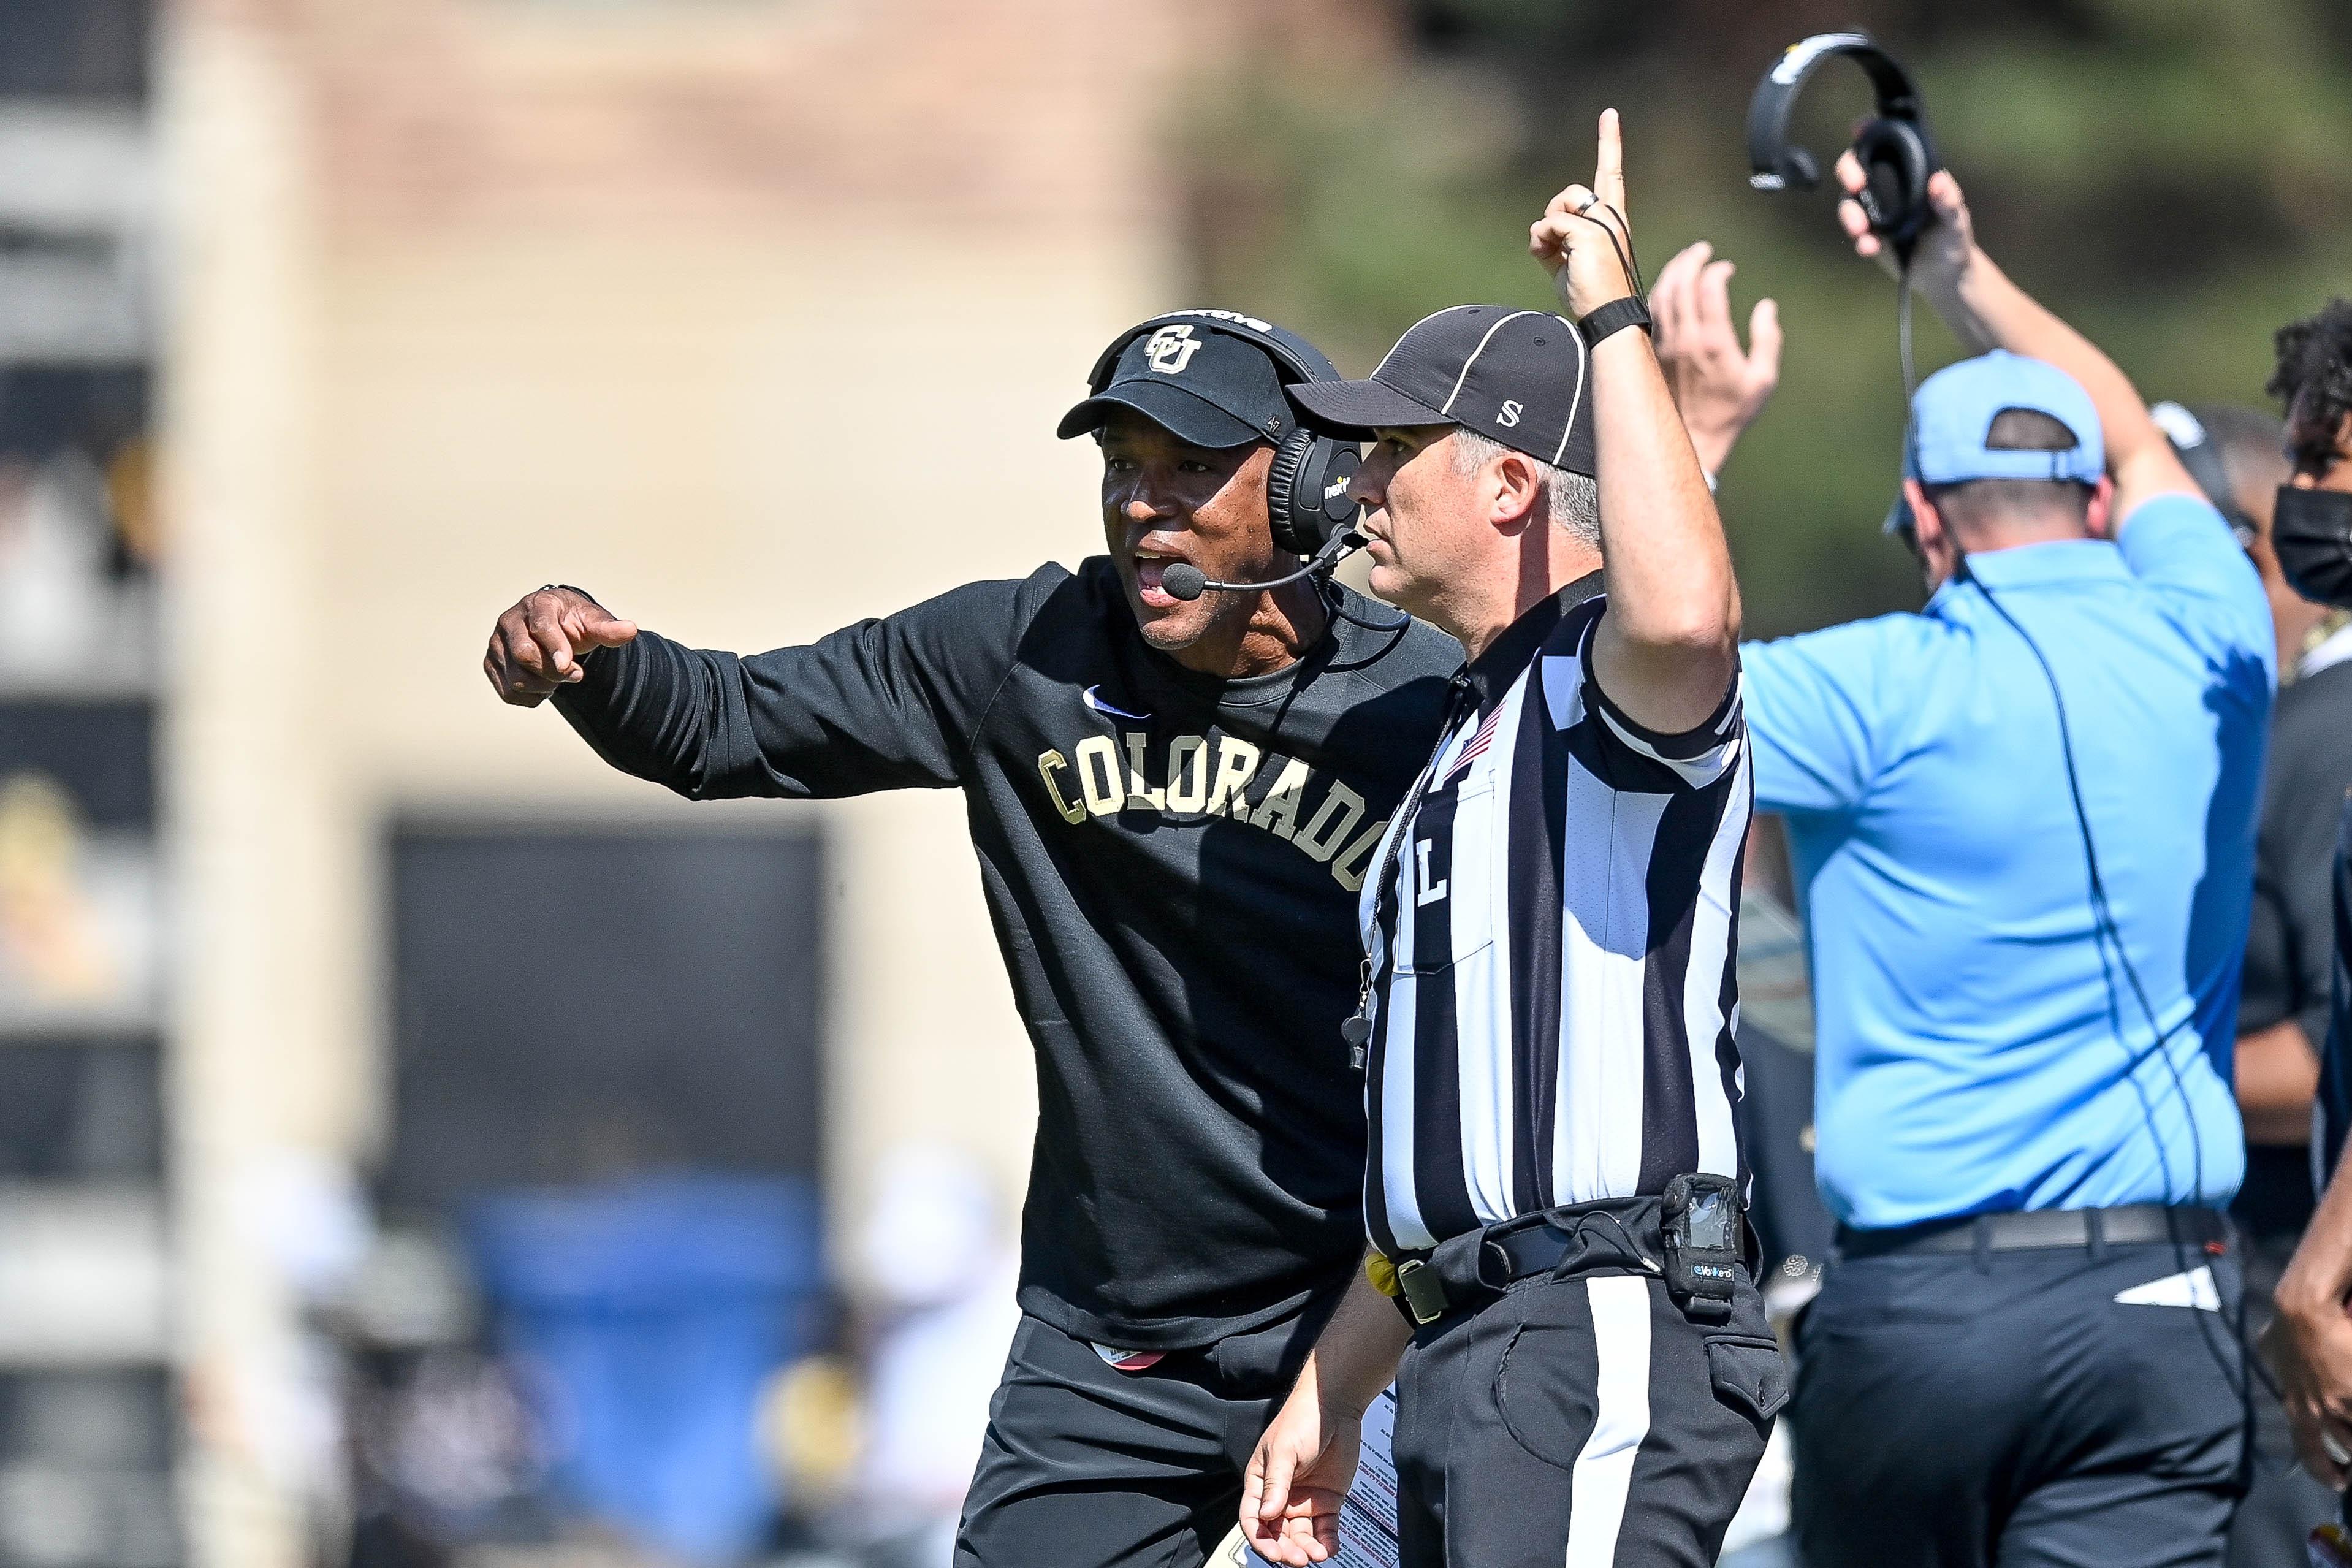 Colorado football coach Karl Dorrell smacks camera after Buffaloes  blowout loss to USC